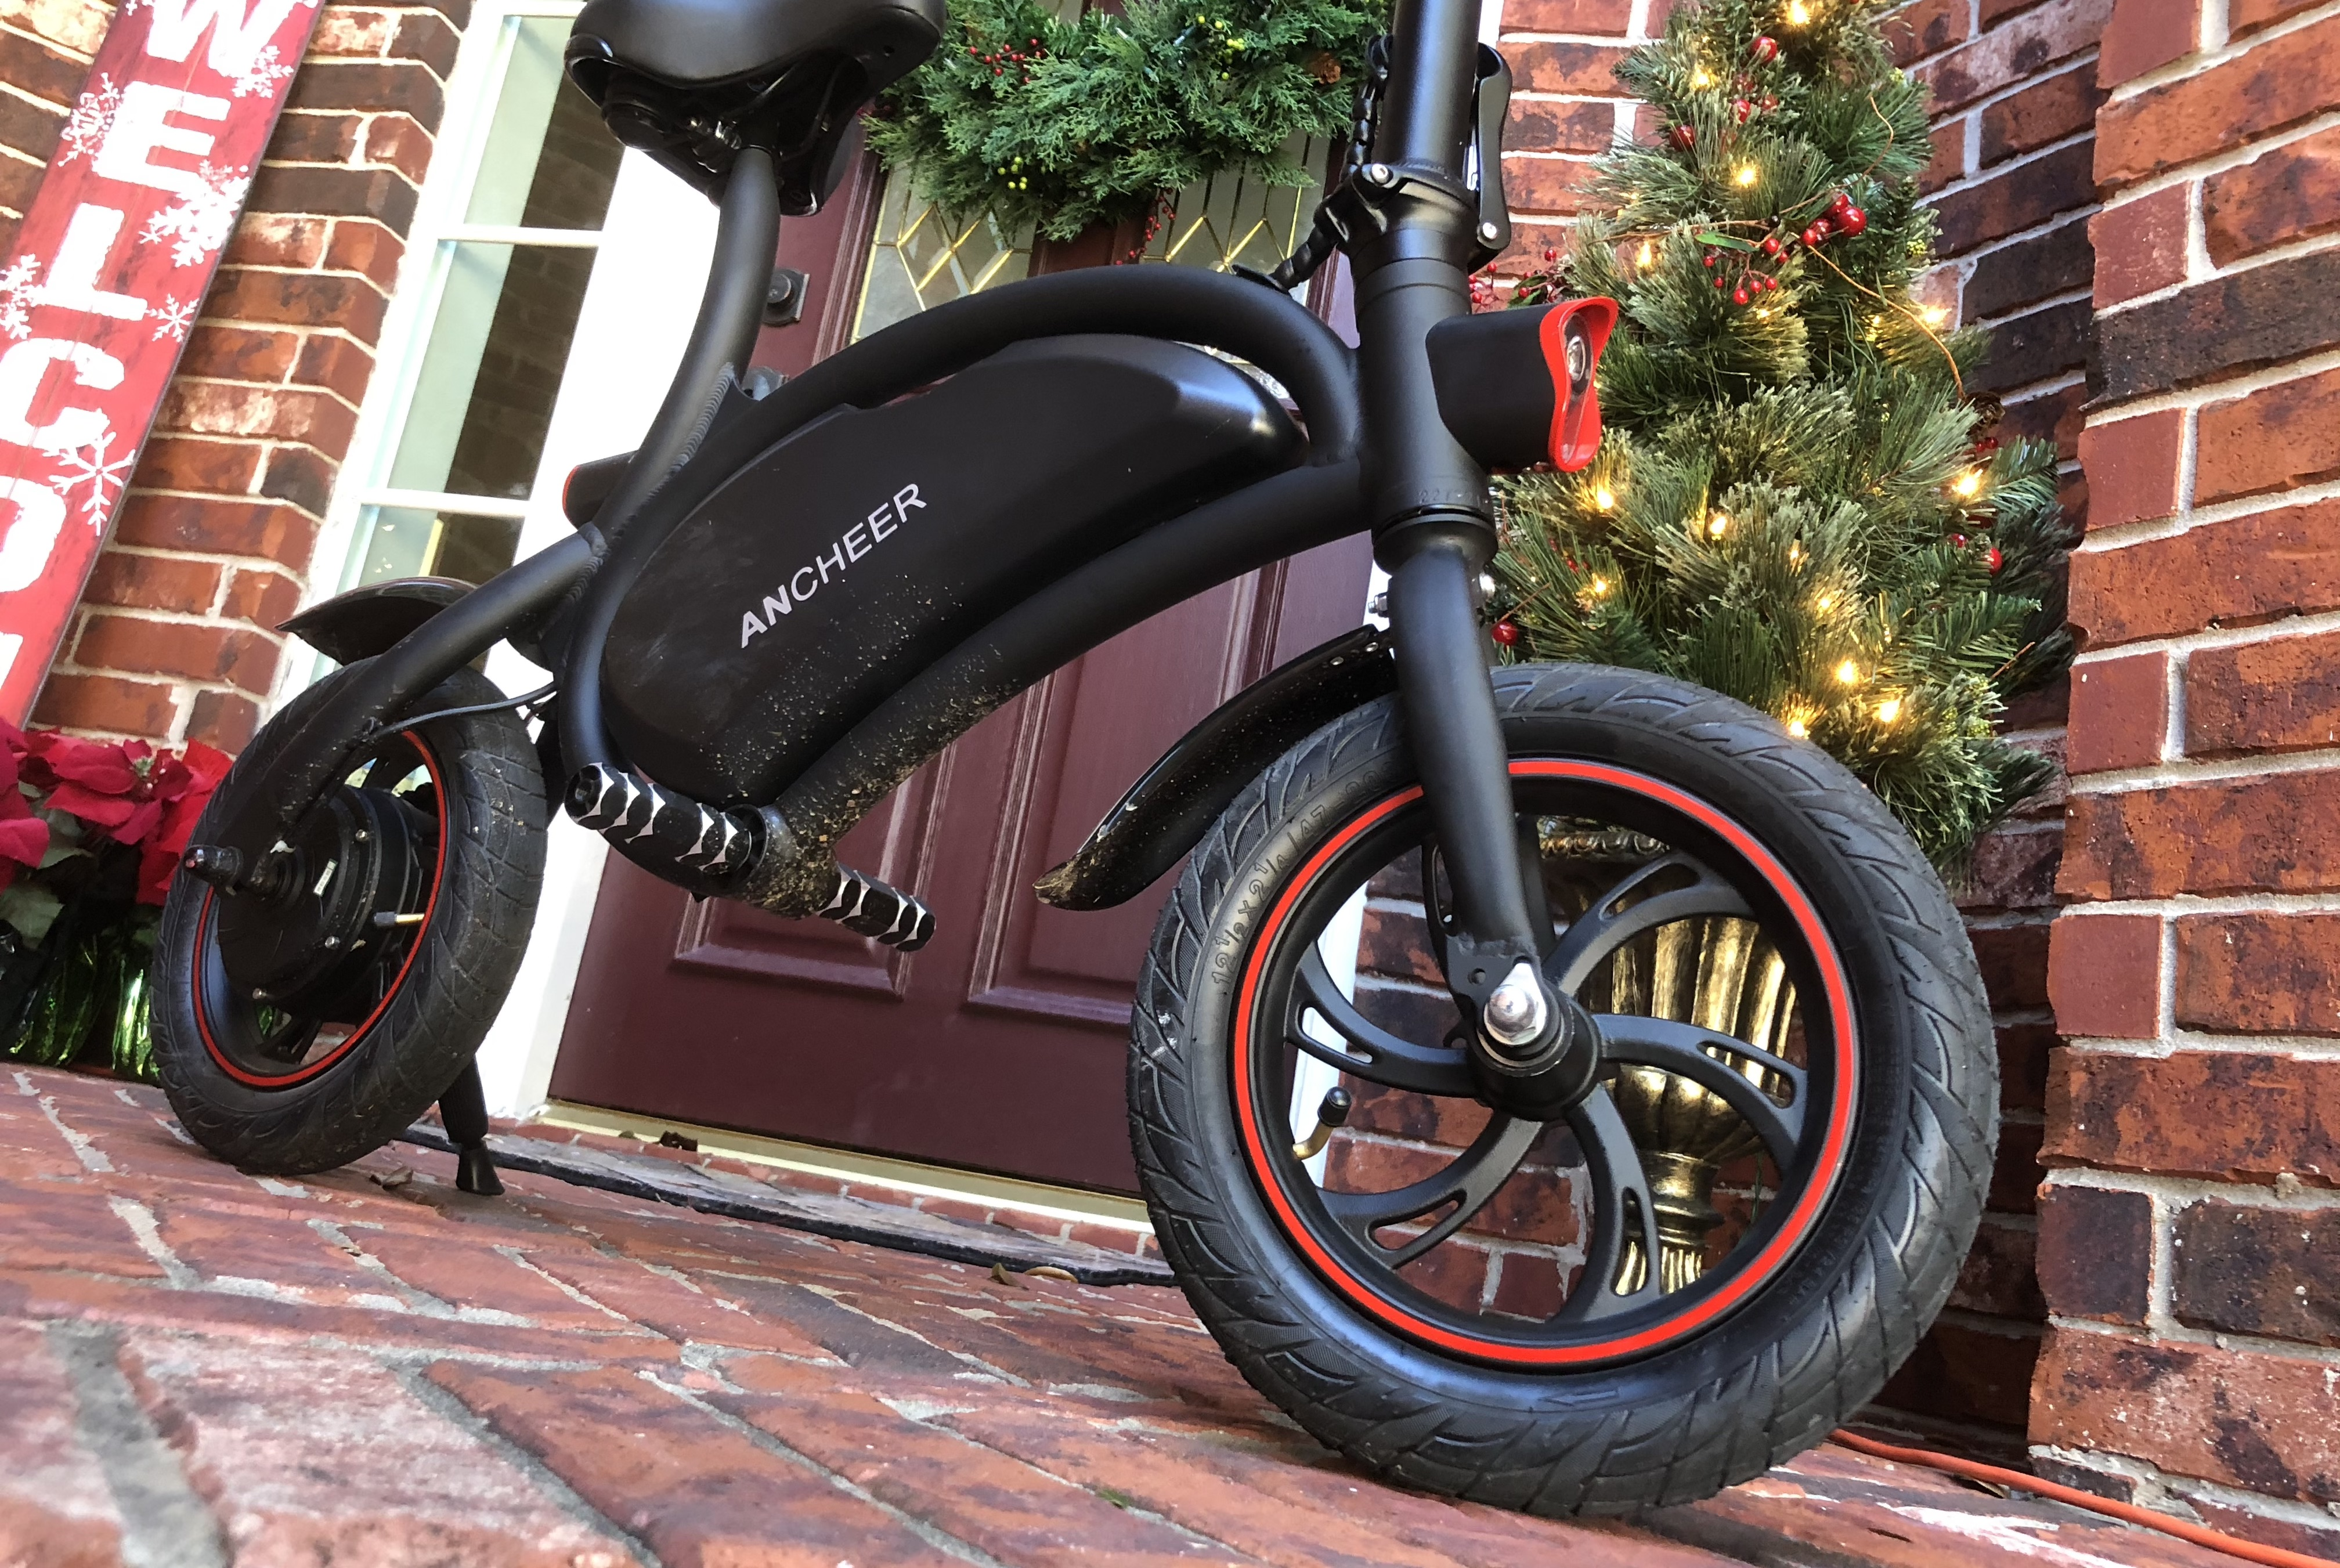 Electrek review: Ancheer folding e-bike/scooter makes a decent commuter ride for under $400